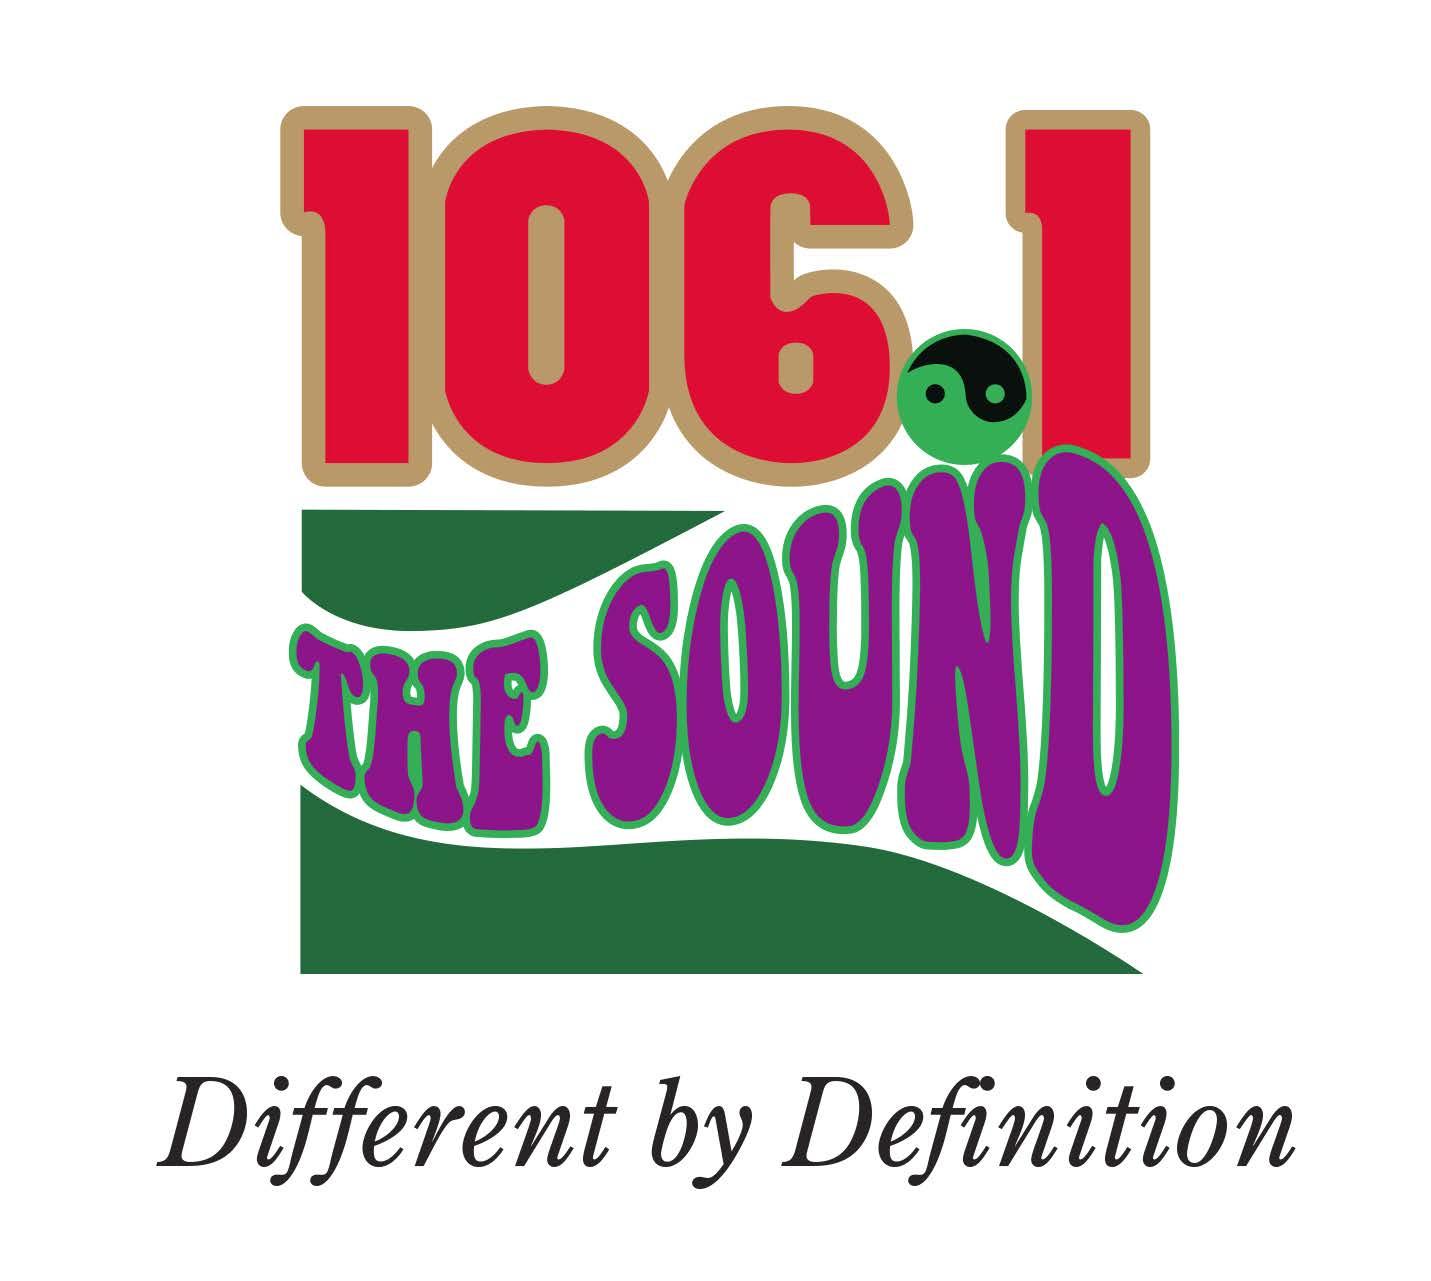 106.1 THE SOUND